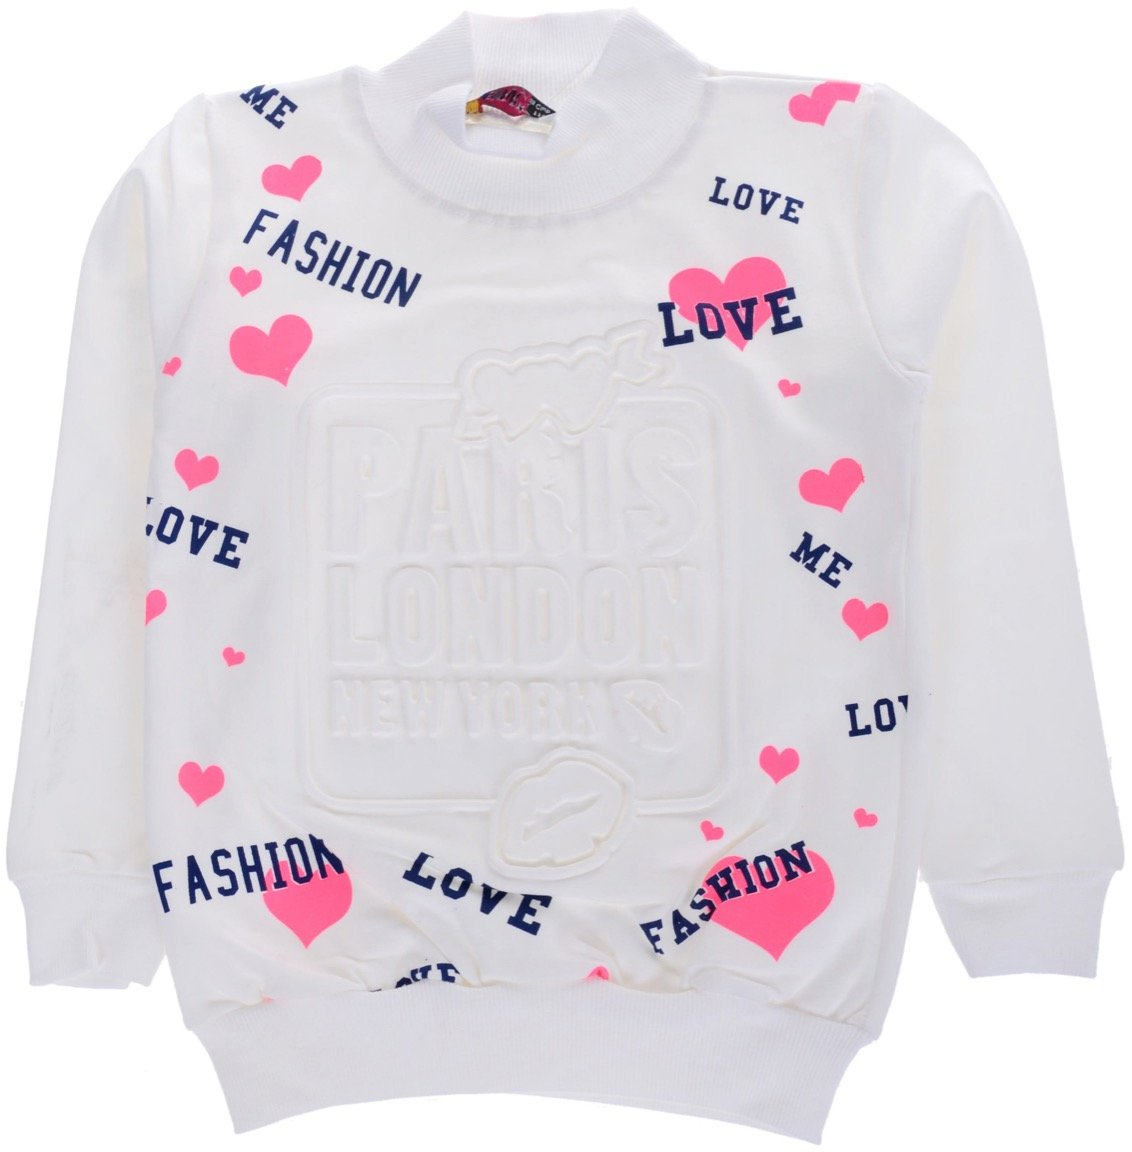 Mix Star παιδική μπλούζα ζιβάγκο «Fashion & Love»